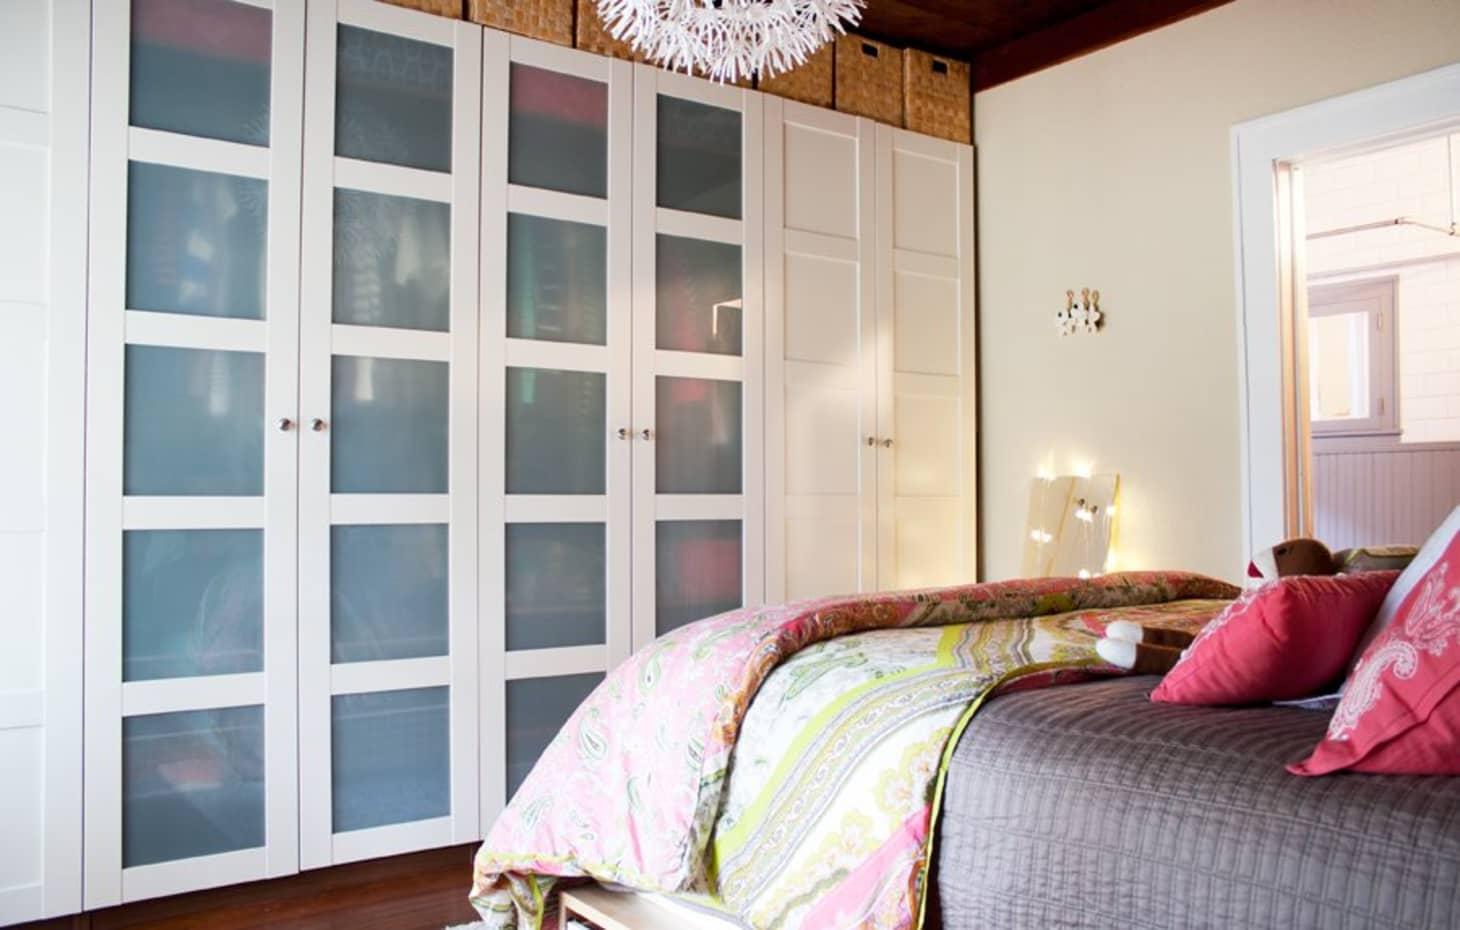 Bedroom storage ideas small bedroom organization - Maximize storage in small bedroom ...